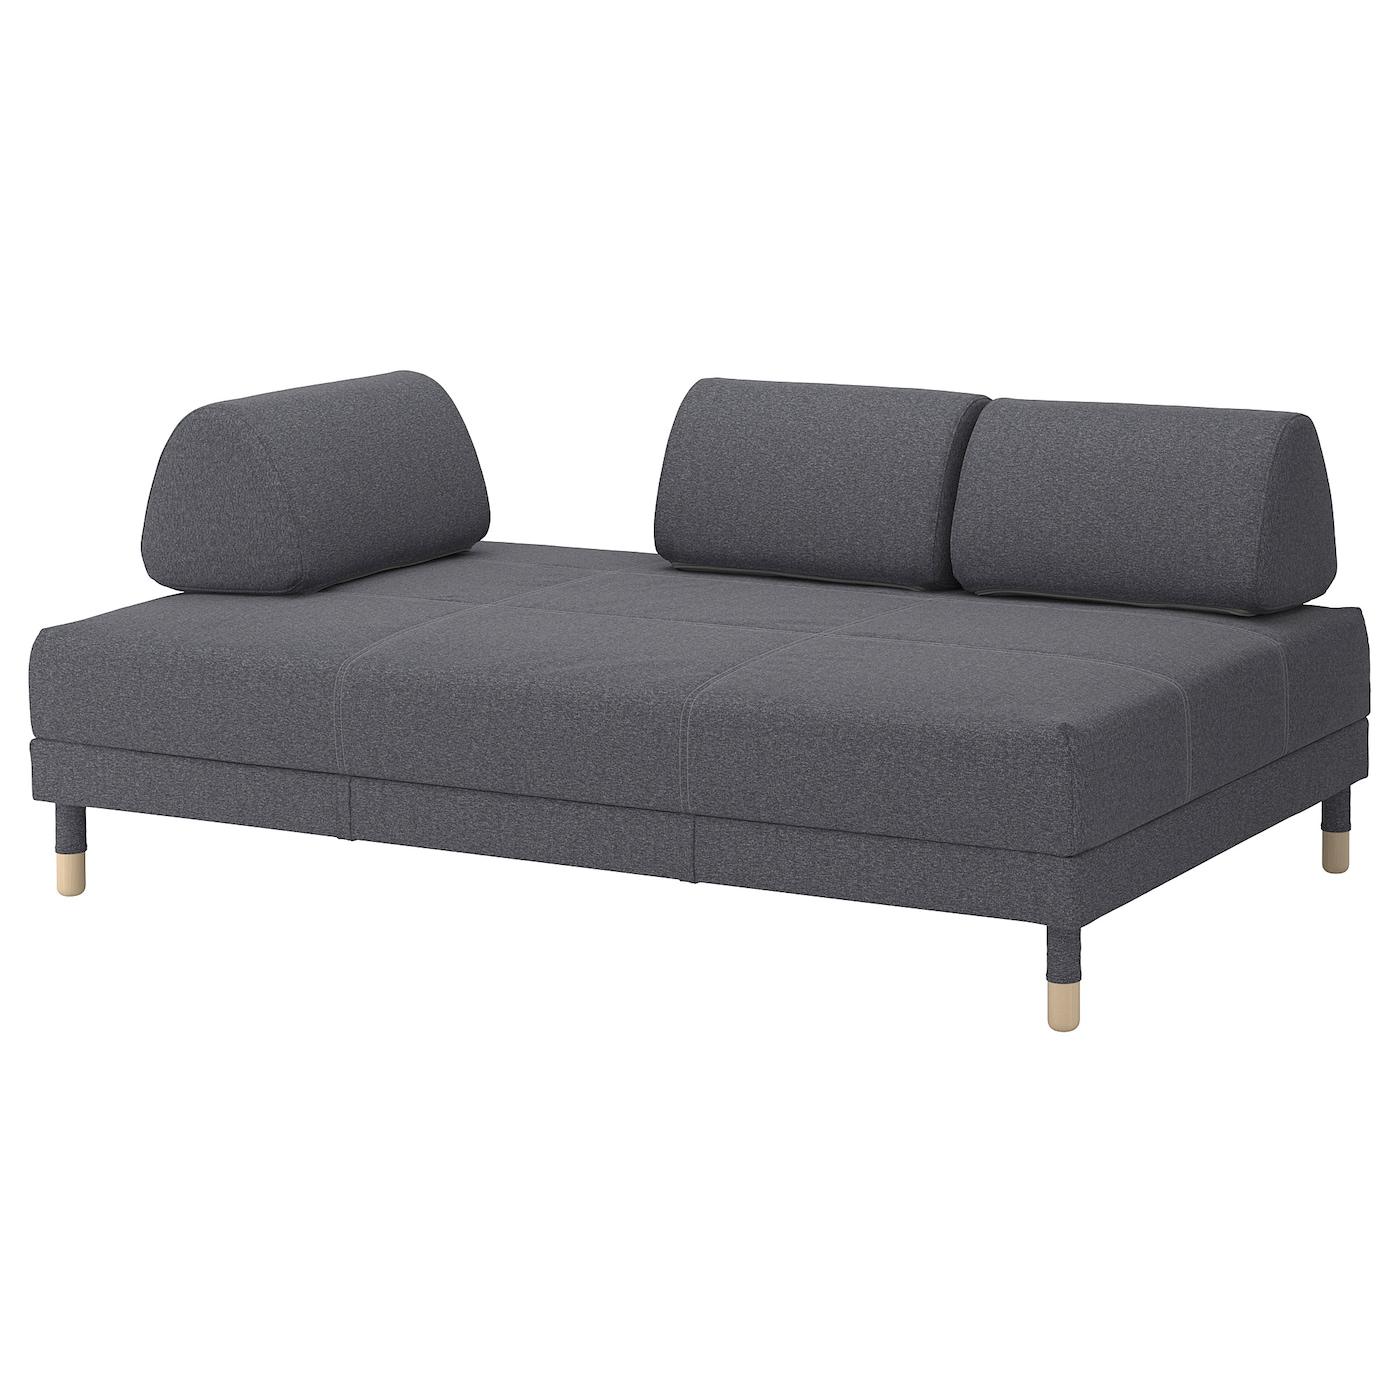 Flottebo Sofa Bed Gunnared Medium Grey 120 Cm Ikea